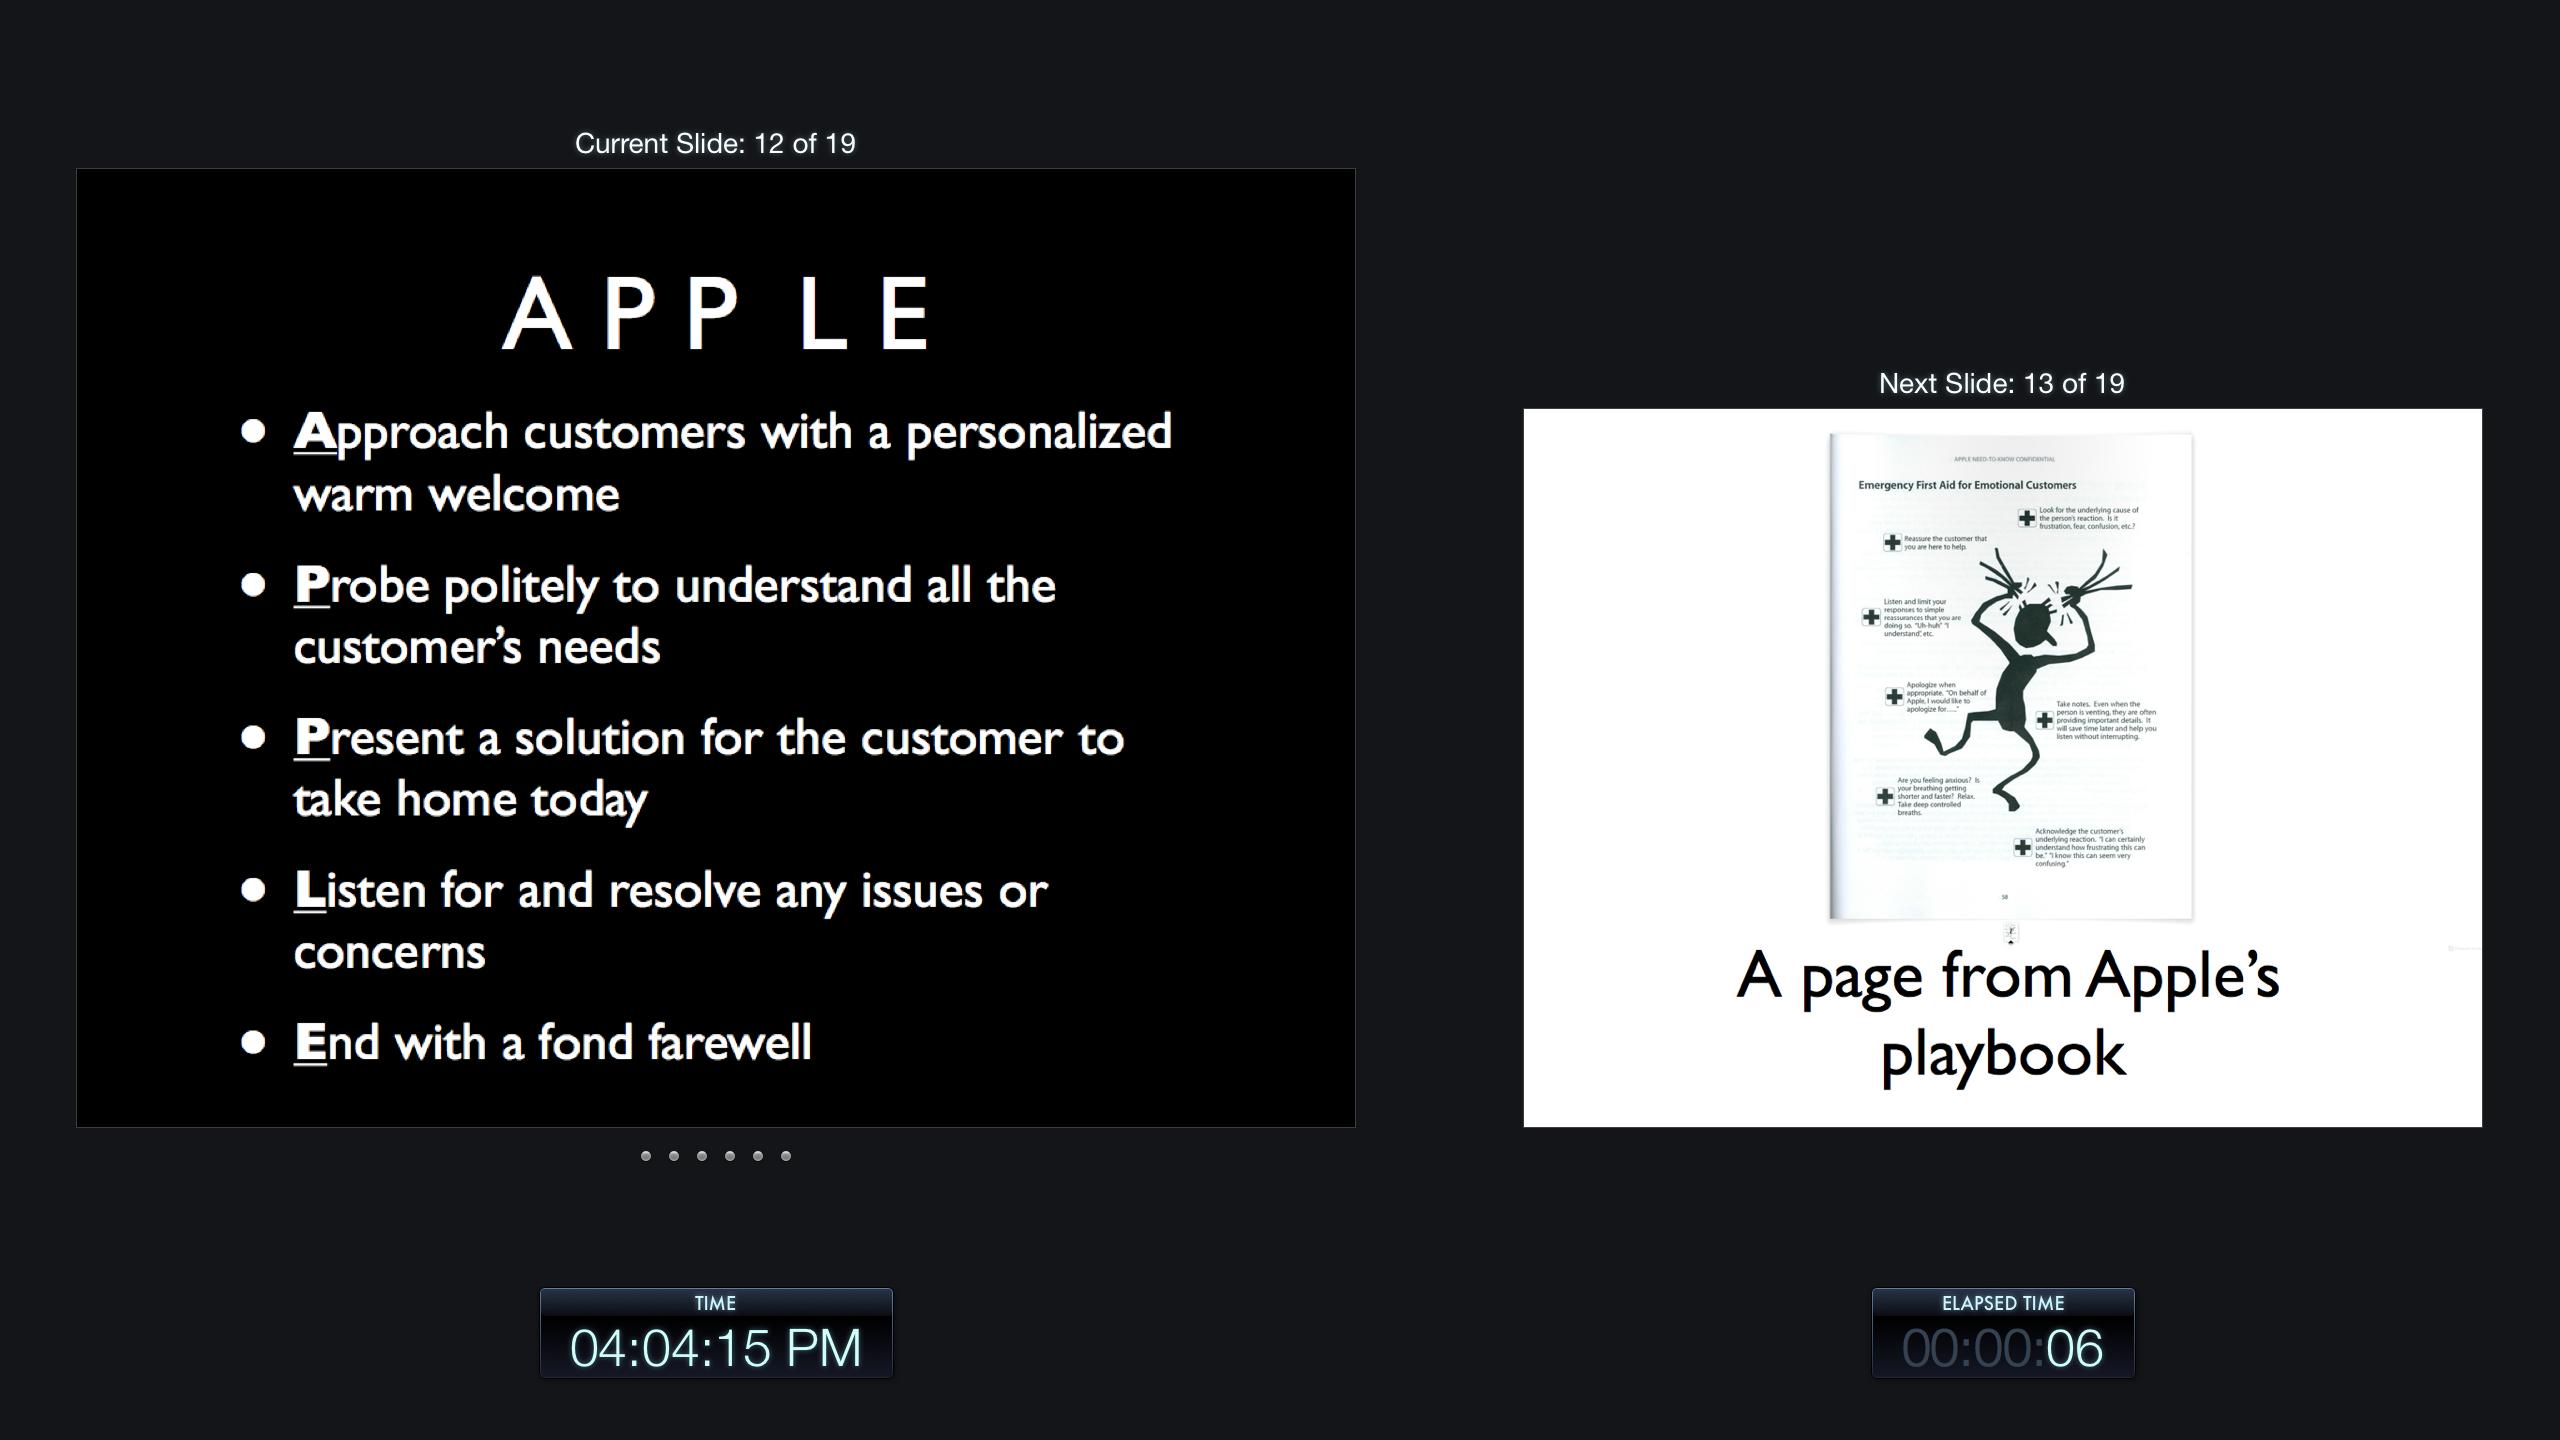 apple 5 steps of service customer service elearning onsite training. Black Bedroom Furniture Sets. Home Design Ideas